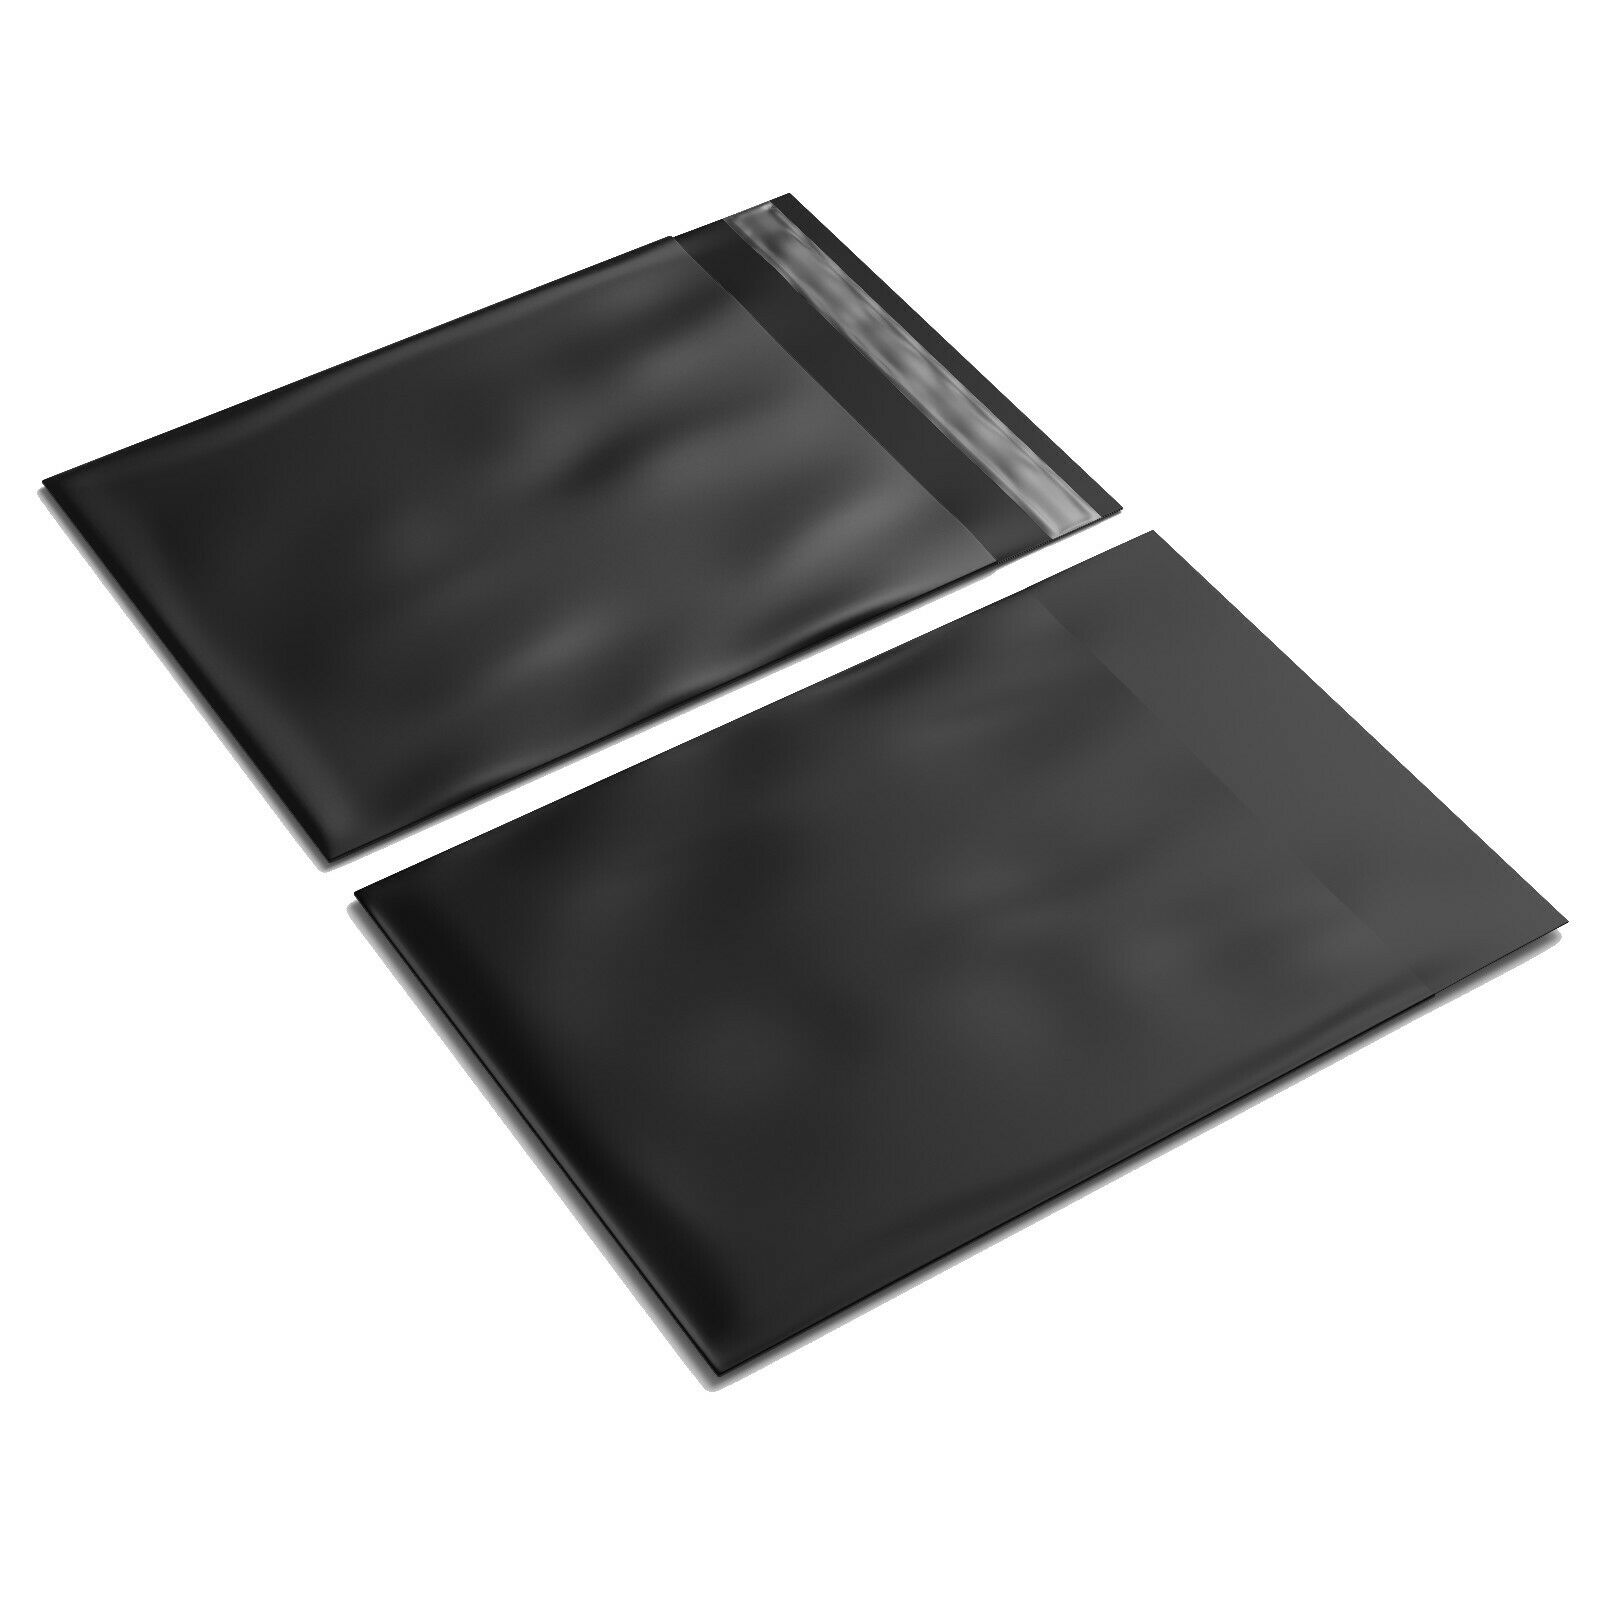 Black Courier Satchel bag